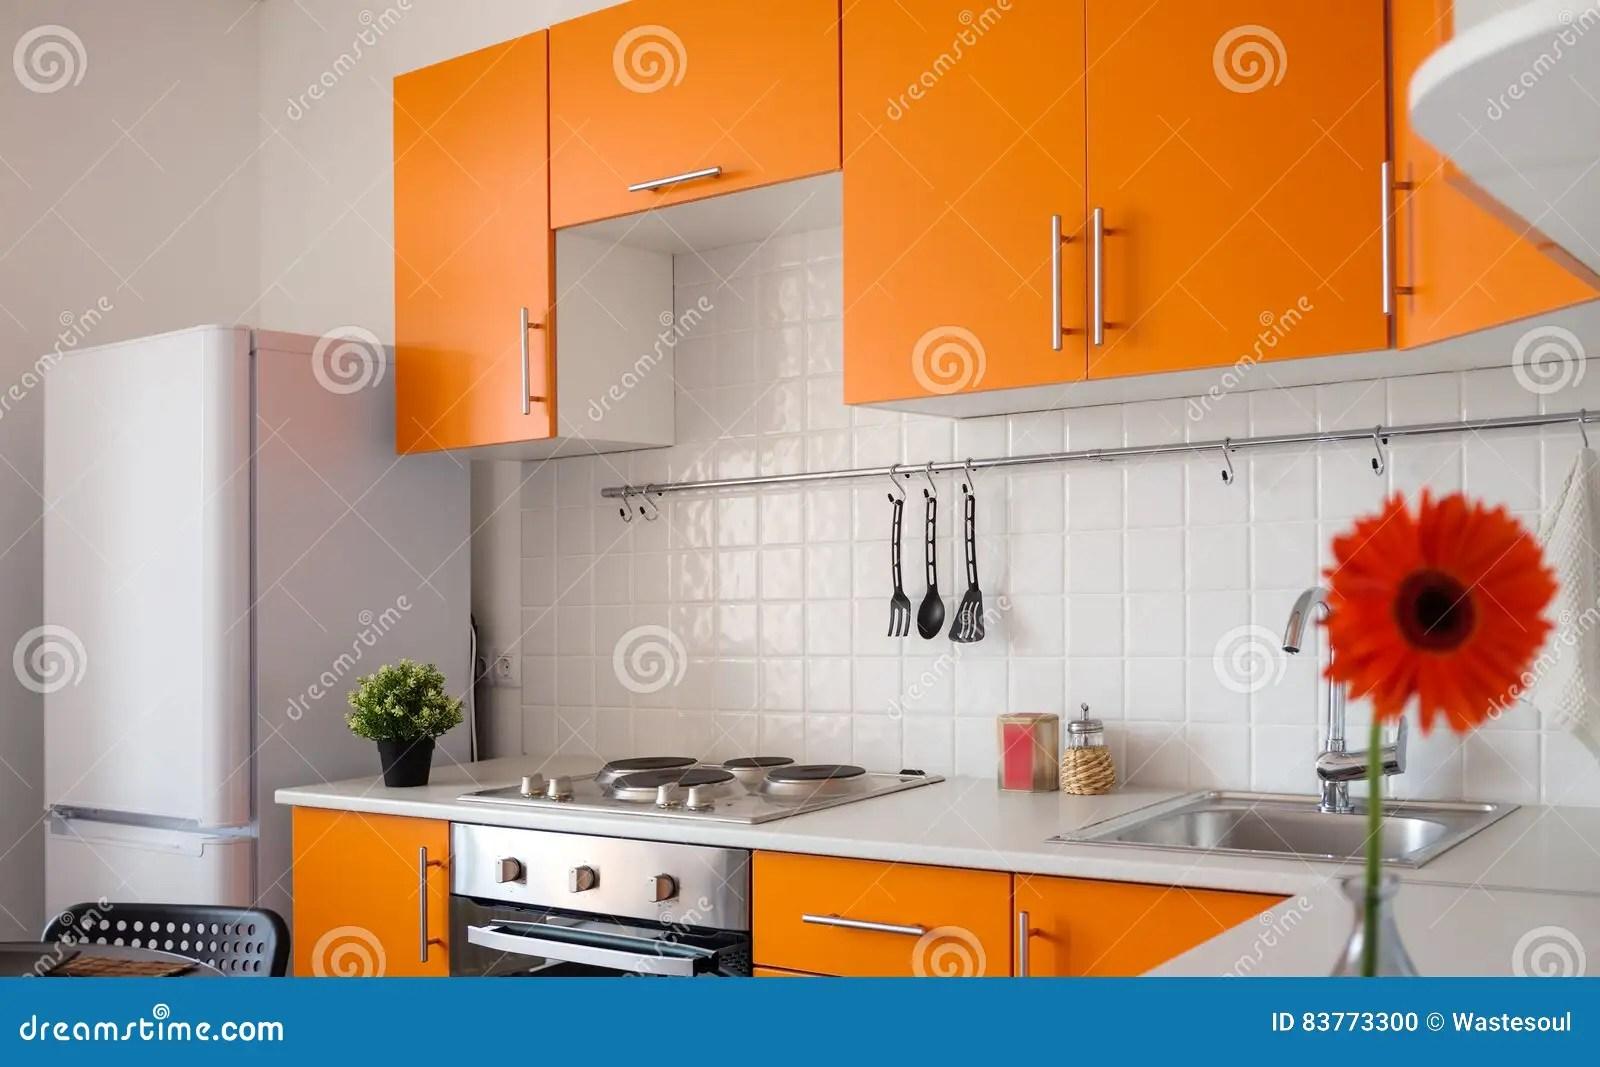 Cucina moderna arancione bagno arancione best pareti arancioni in